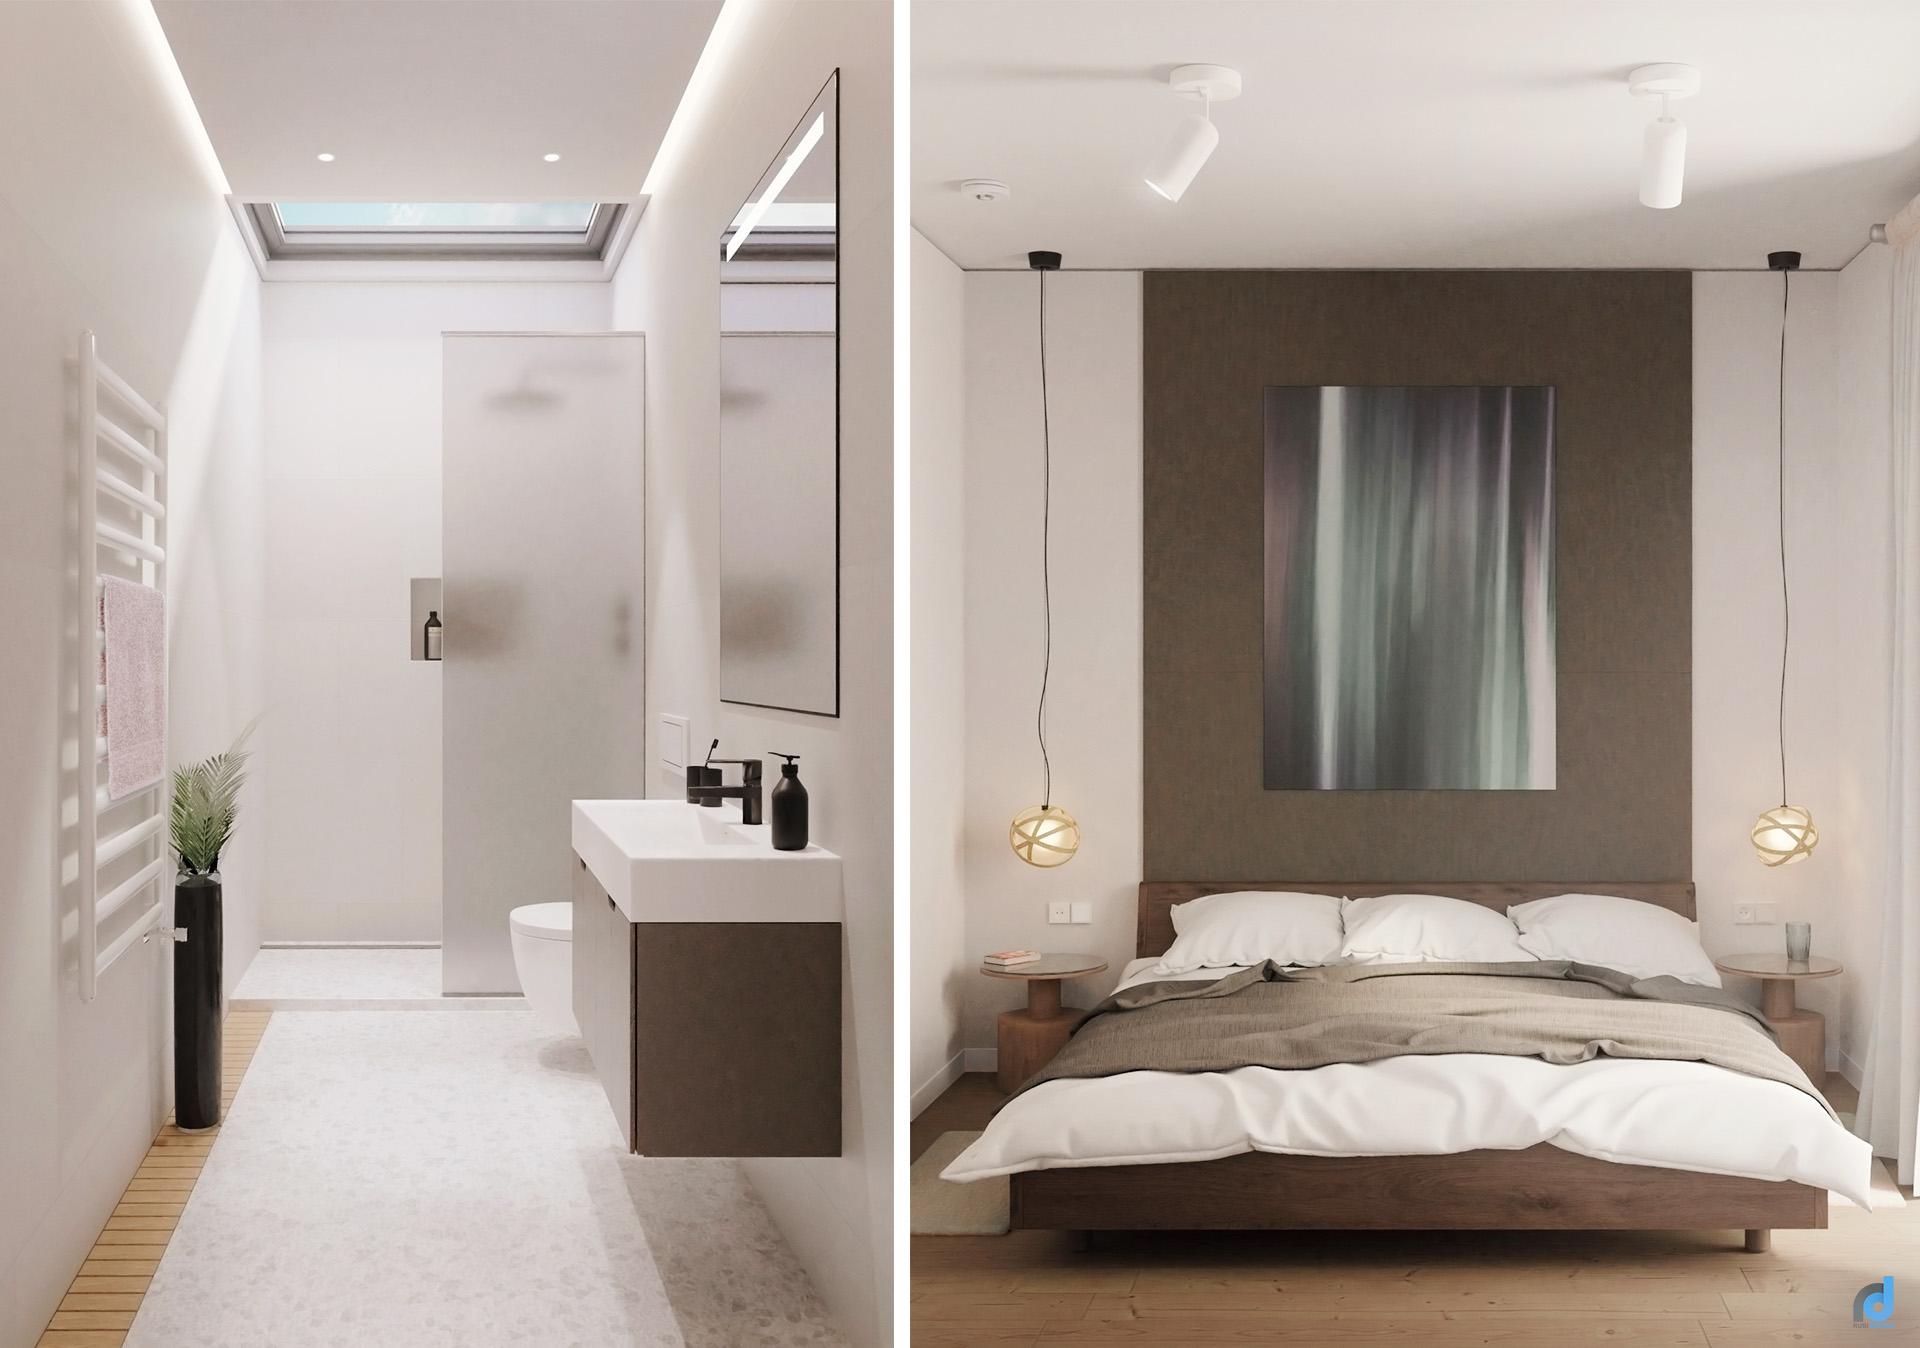 Apartment Berlin -bed-and bathroom interior design